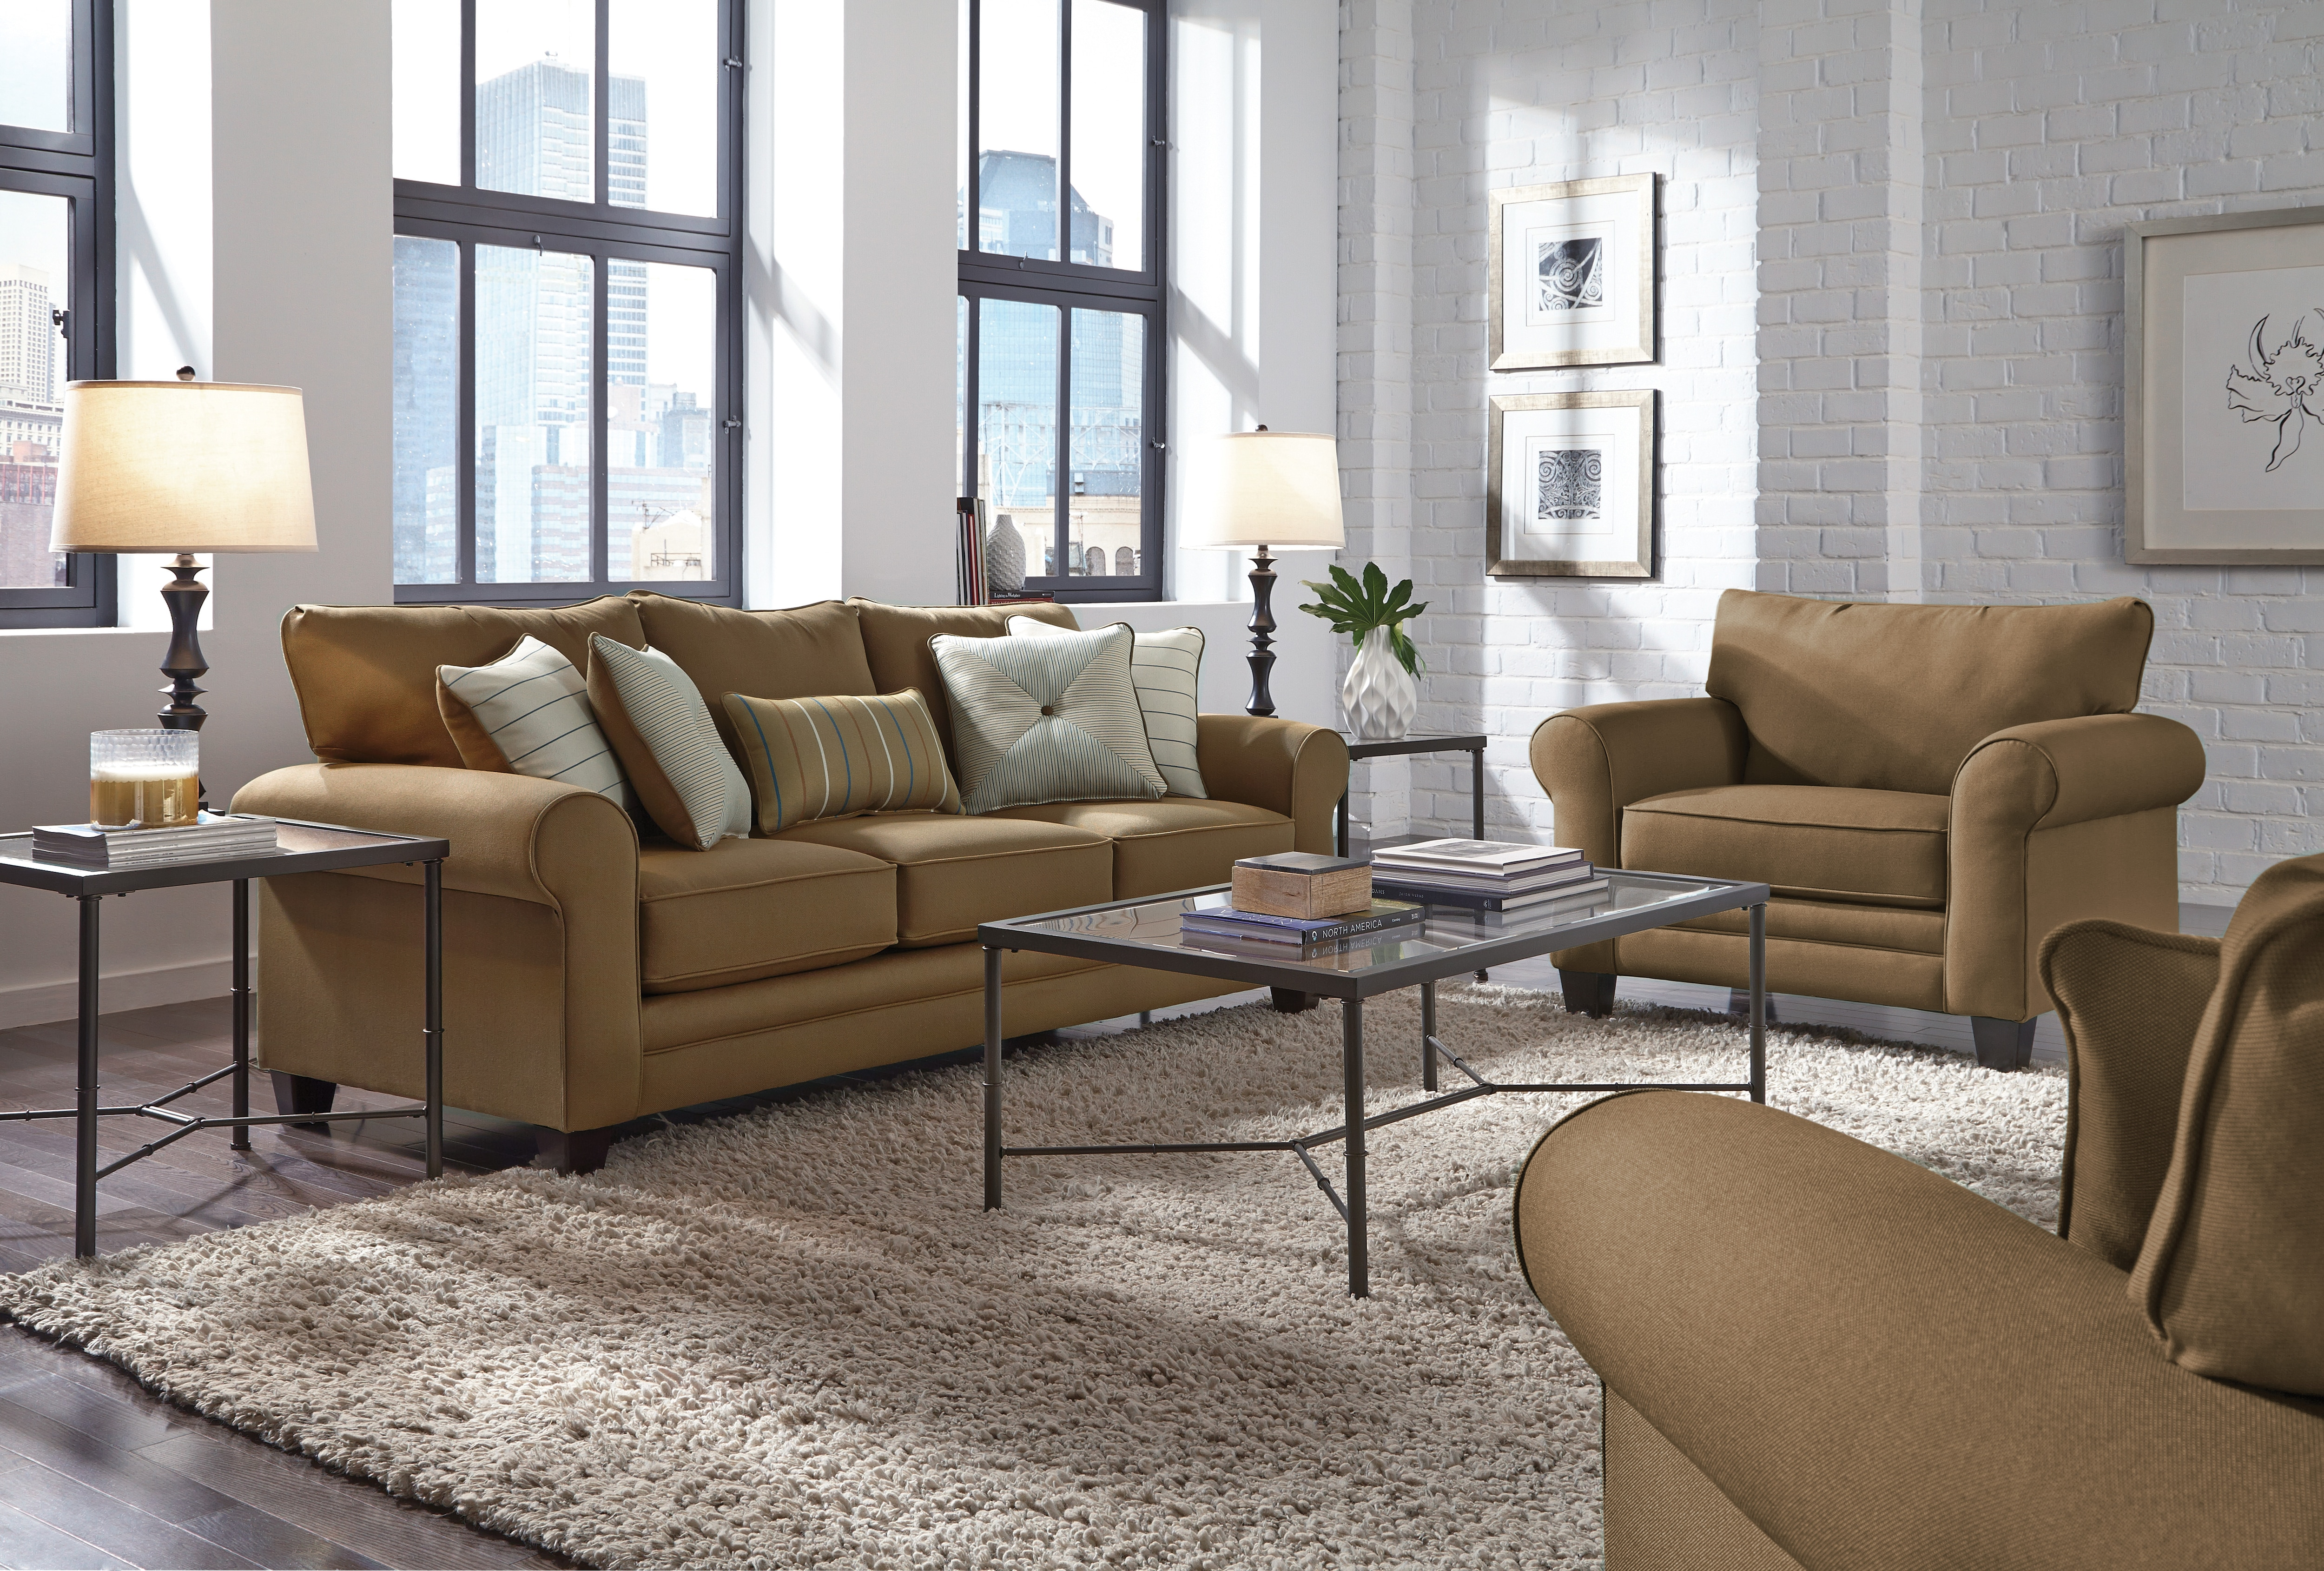 Living Room Furniture - Aspire Sofa - Copper